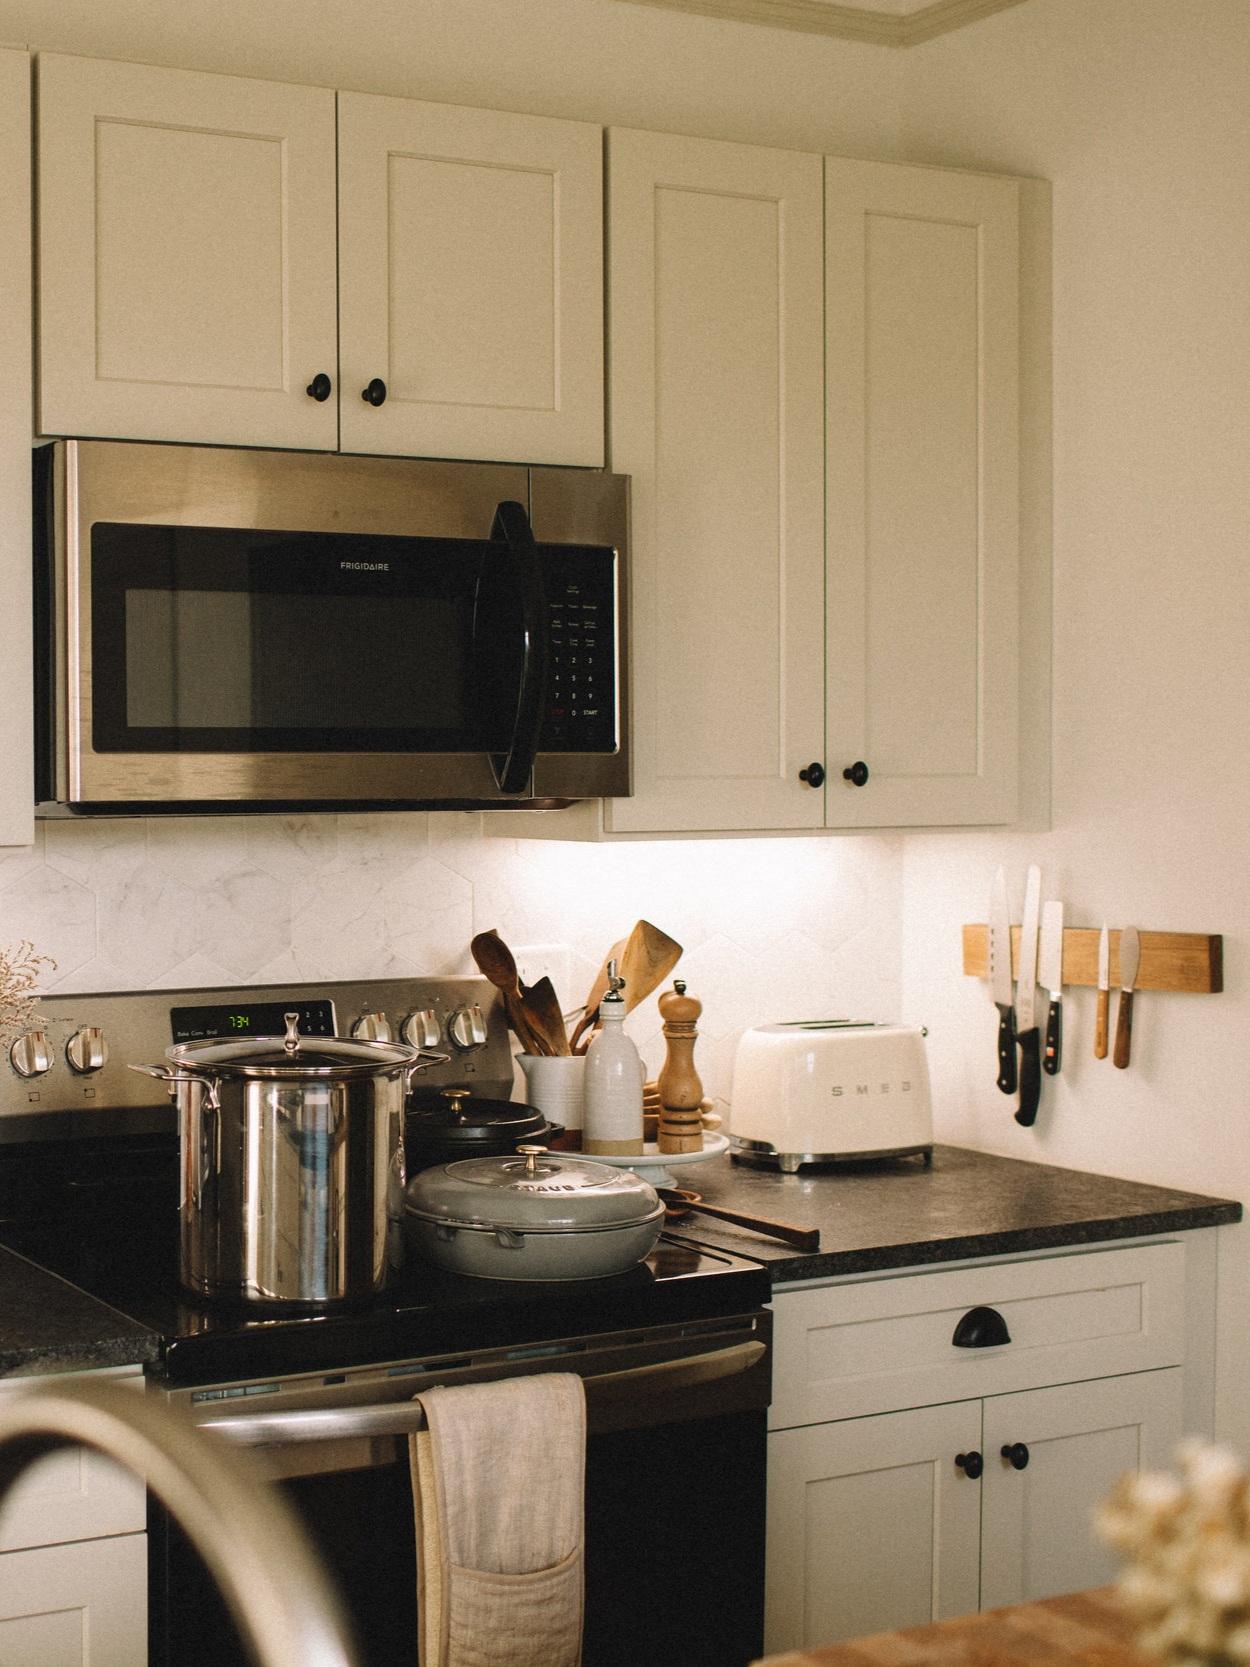 Artichokes-Kitchen_7-15-19-20.jpg